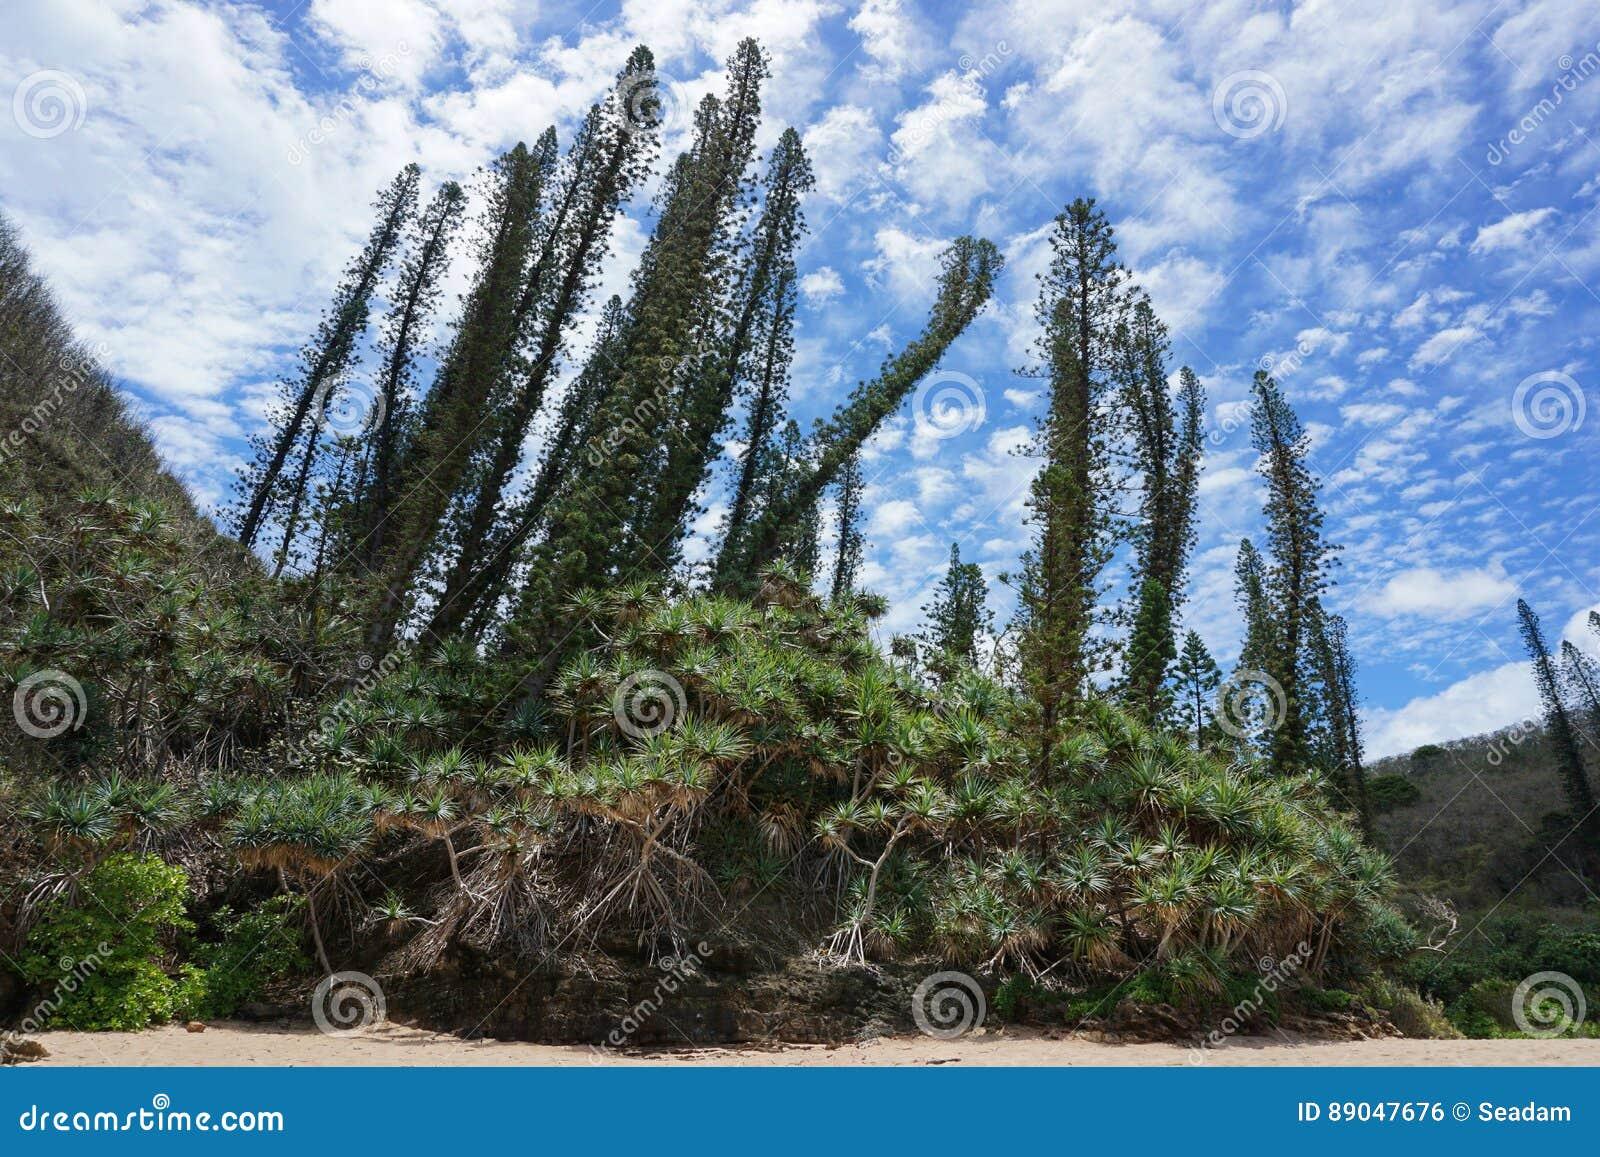 Nowe Caledonia endemiczne sosny z pandanowami